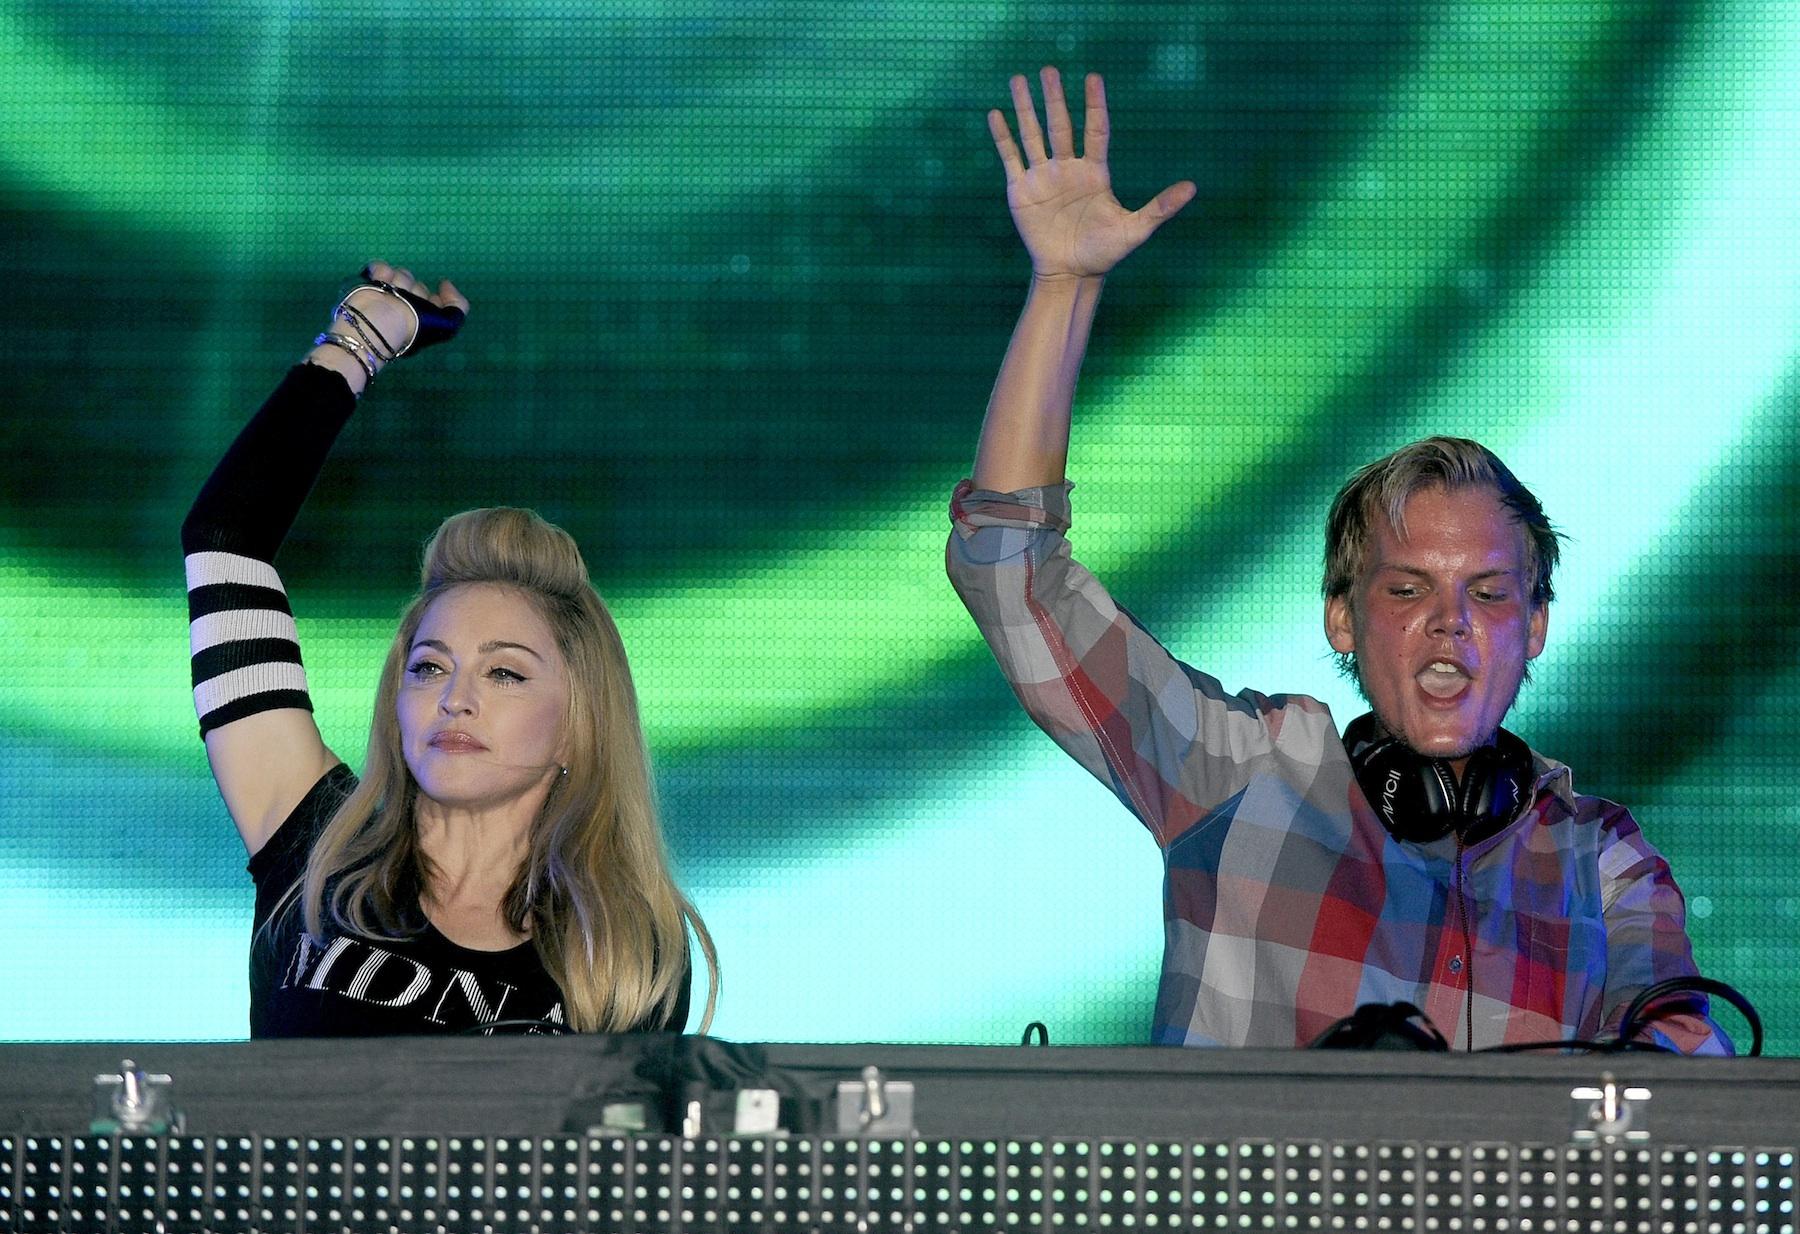 Madonna Announces Collaboration With Avicii